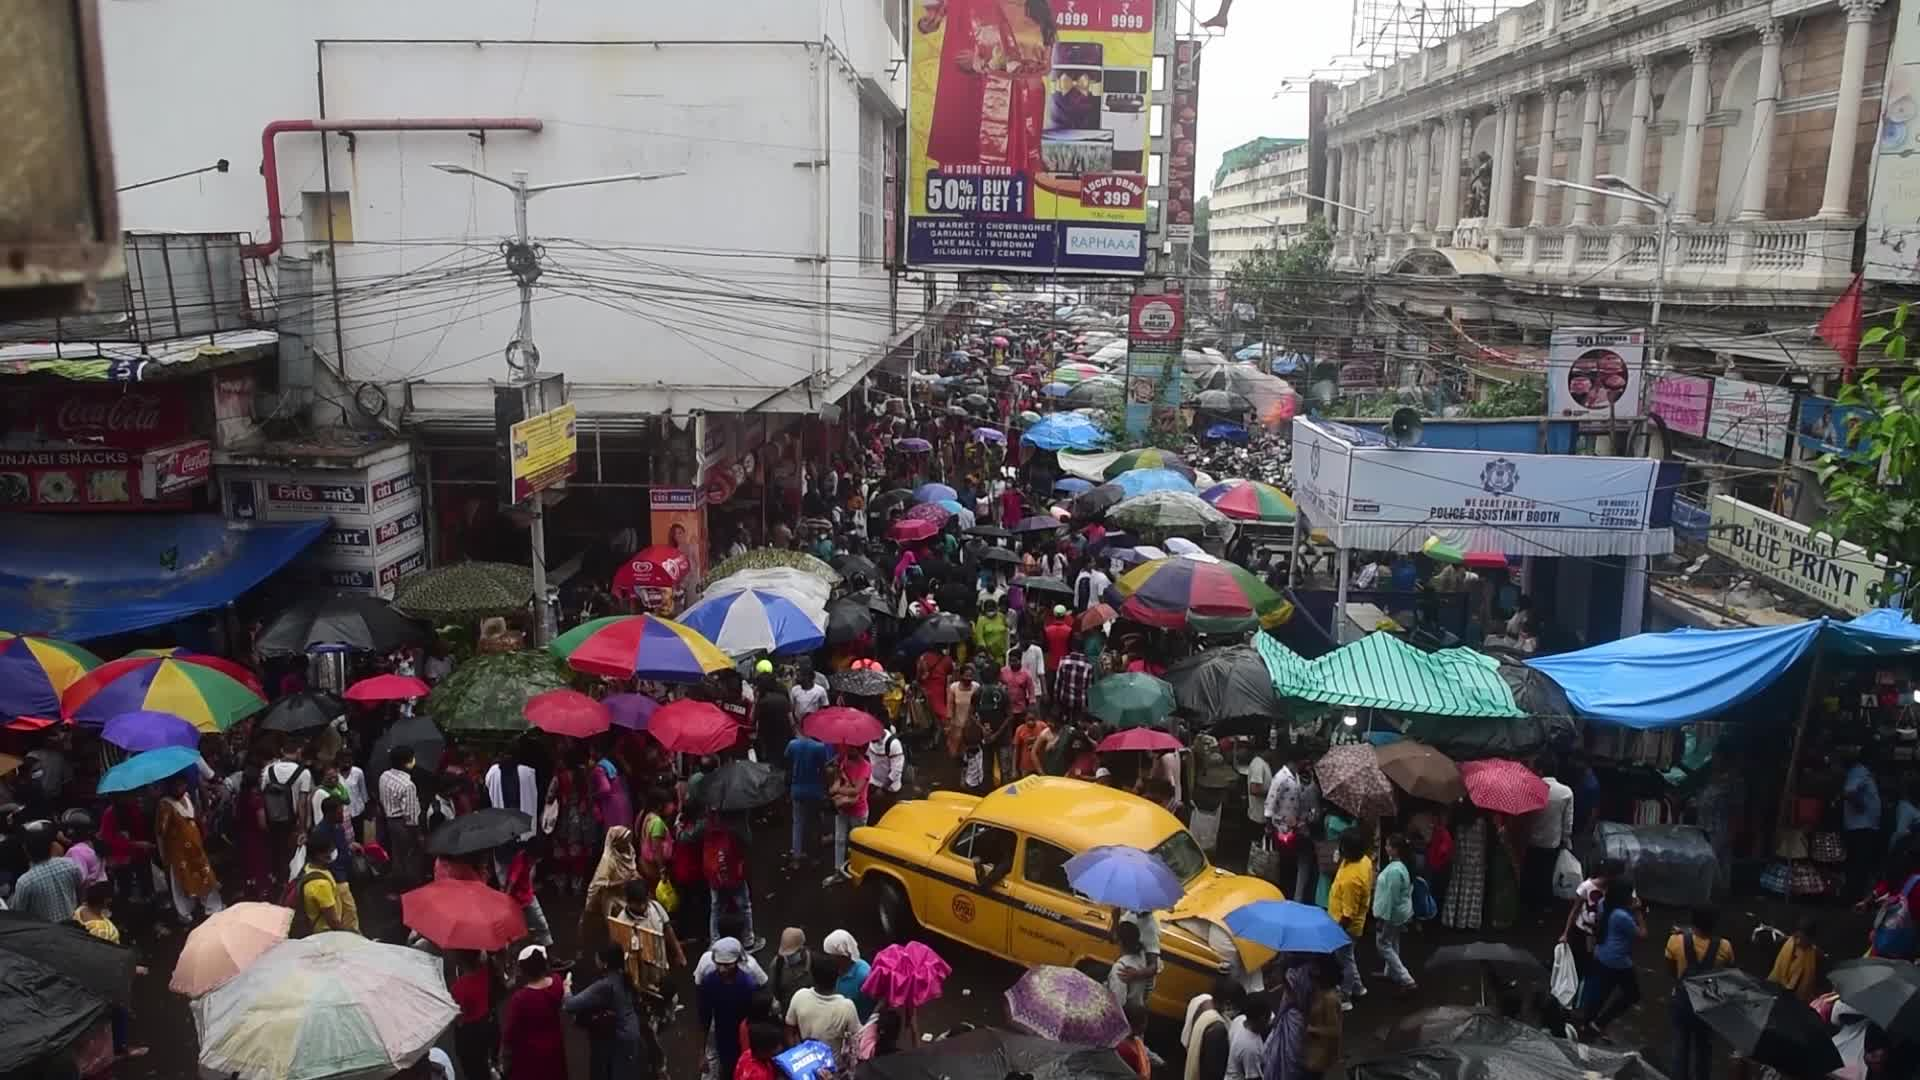 Daily life amid the Covid-19 pandemic in Kolkata, India